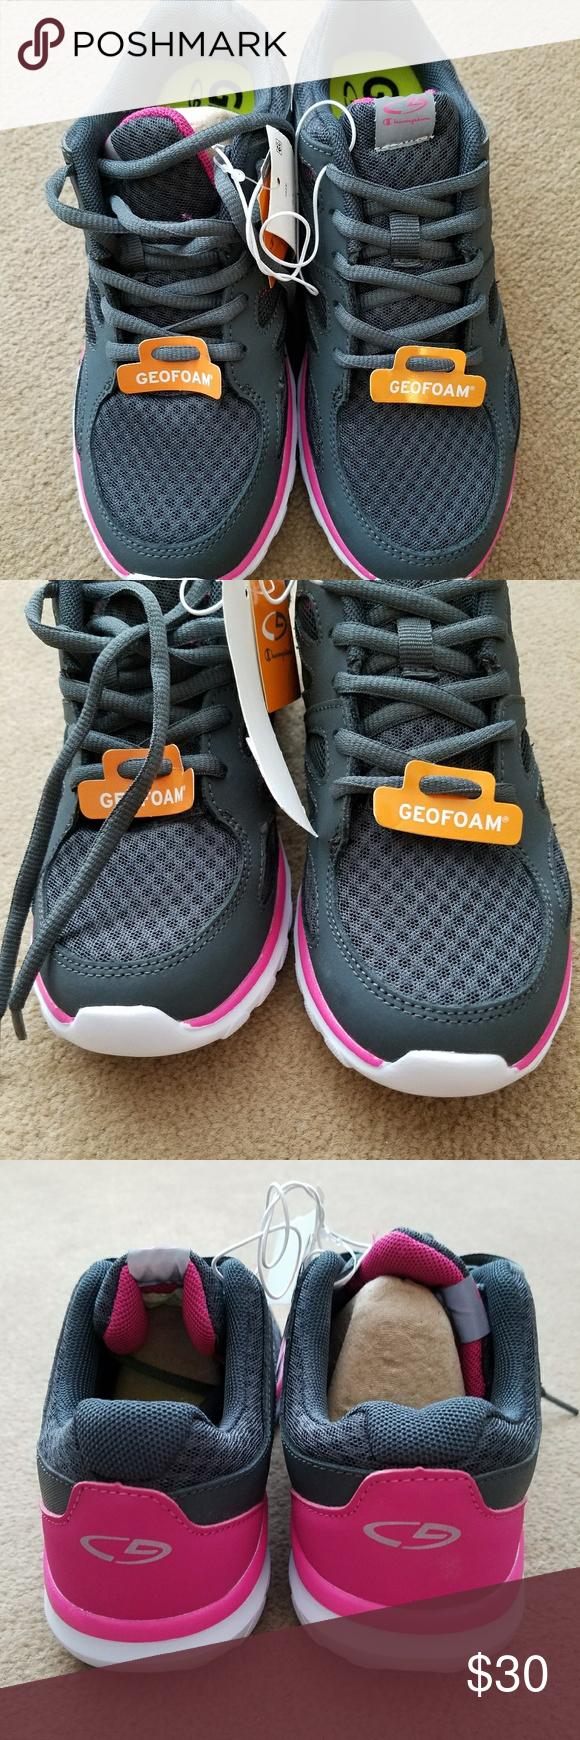 5cb9dc80c1bc76 Women s Champion Sneakers Grey Size 6.5 GeoFoam cushioning ...